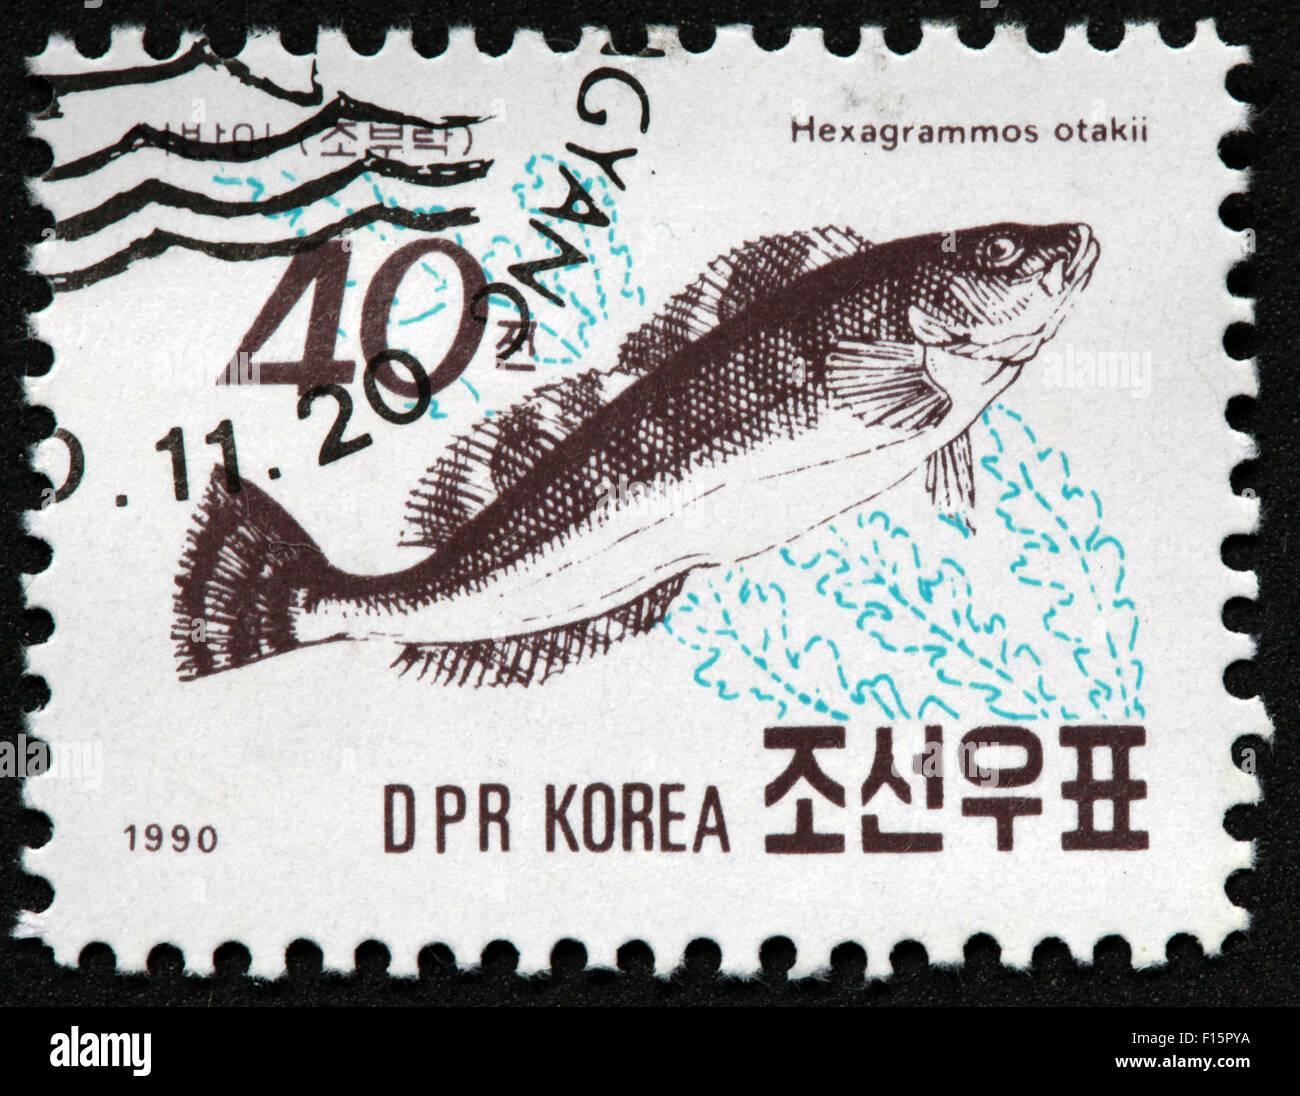 DPR Korea 1990 Hexagrammos Otakii Fisch Unkraut braunen Stempel Stockfoto